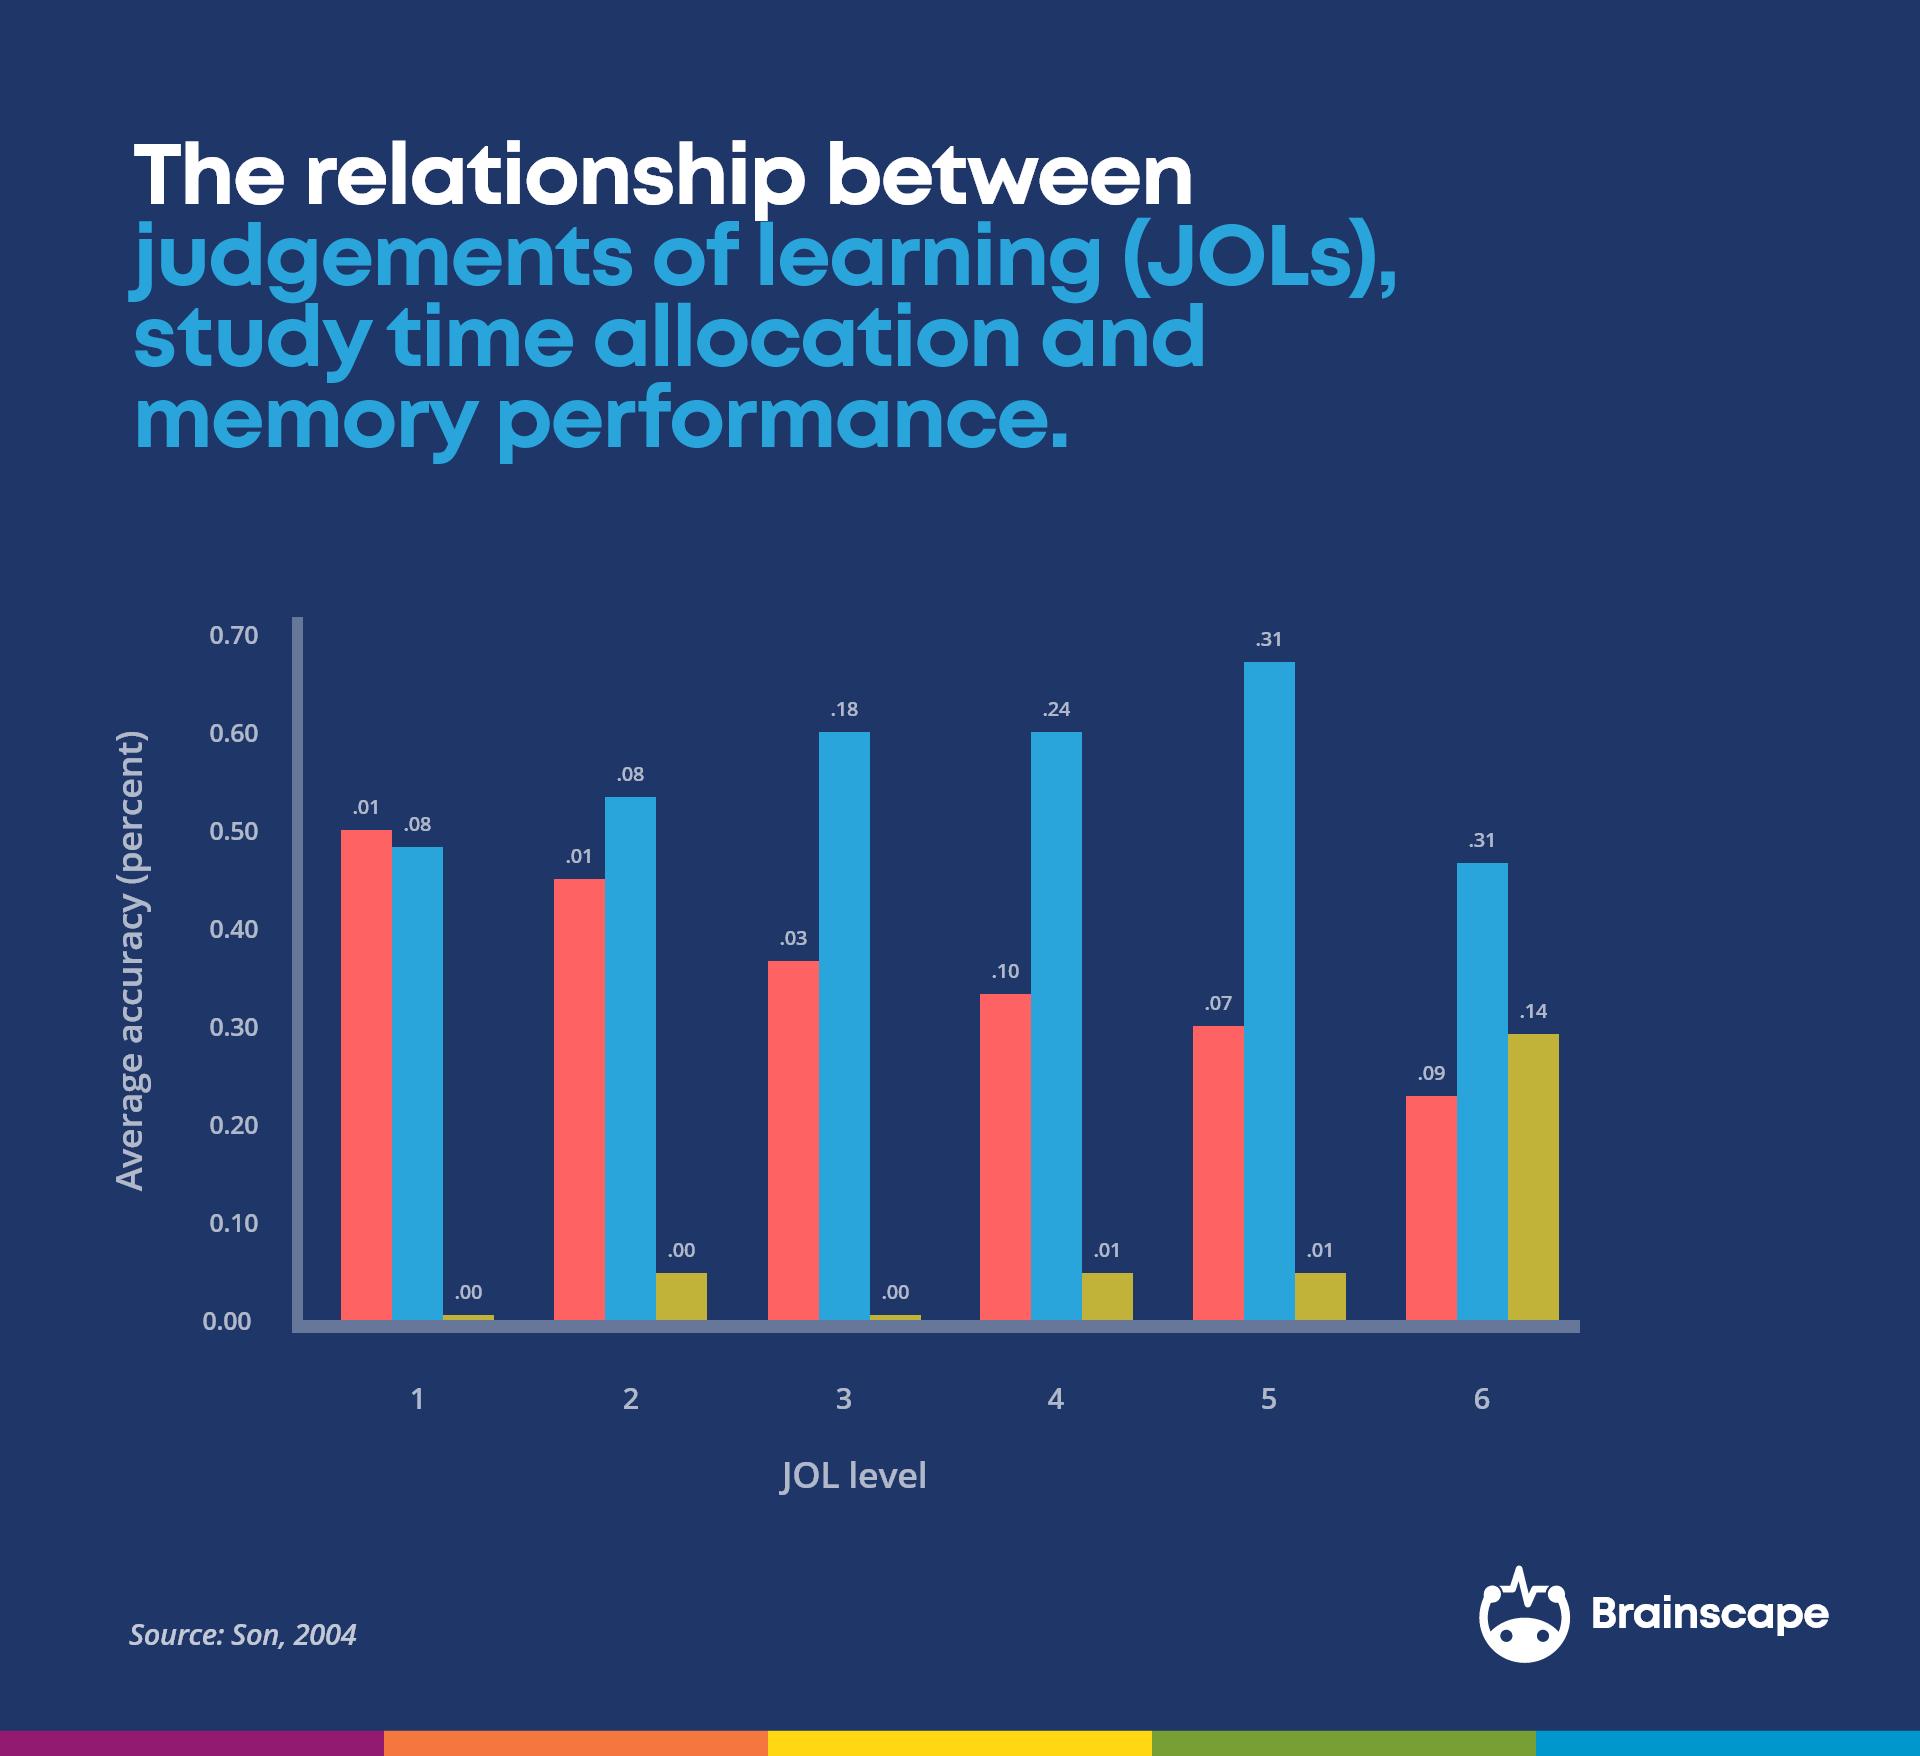 JOL study time allocation son 2004